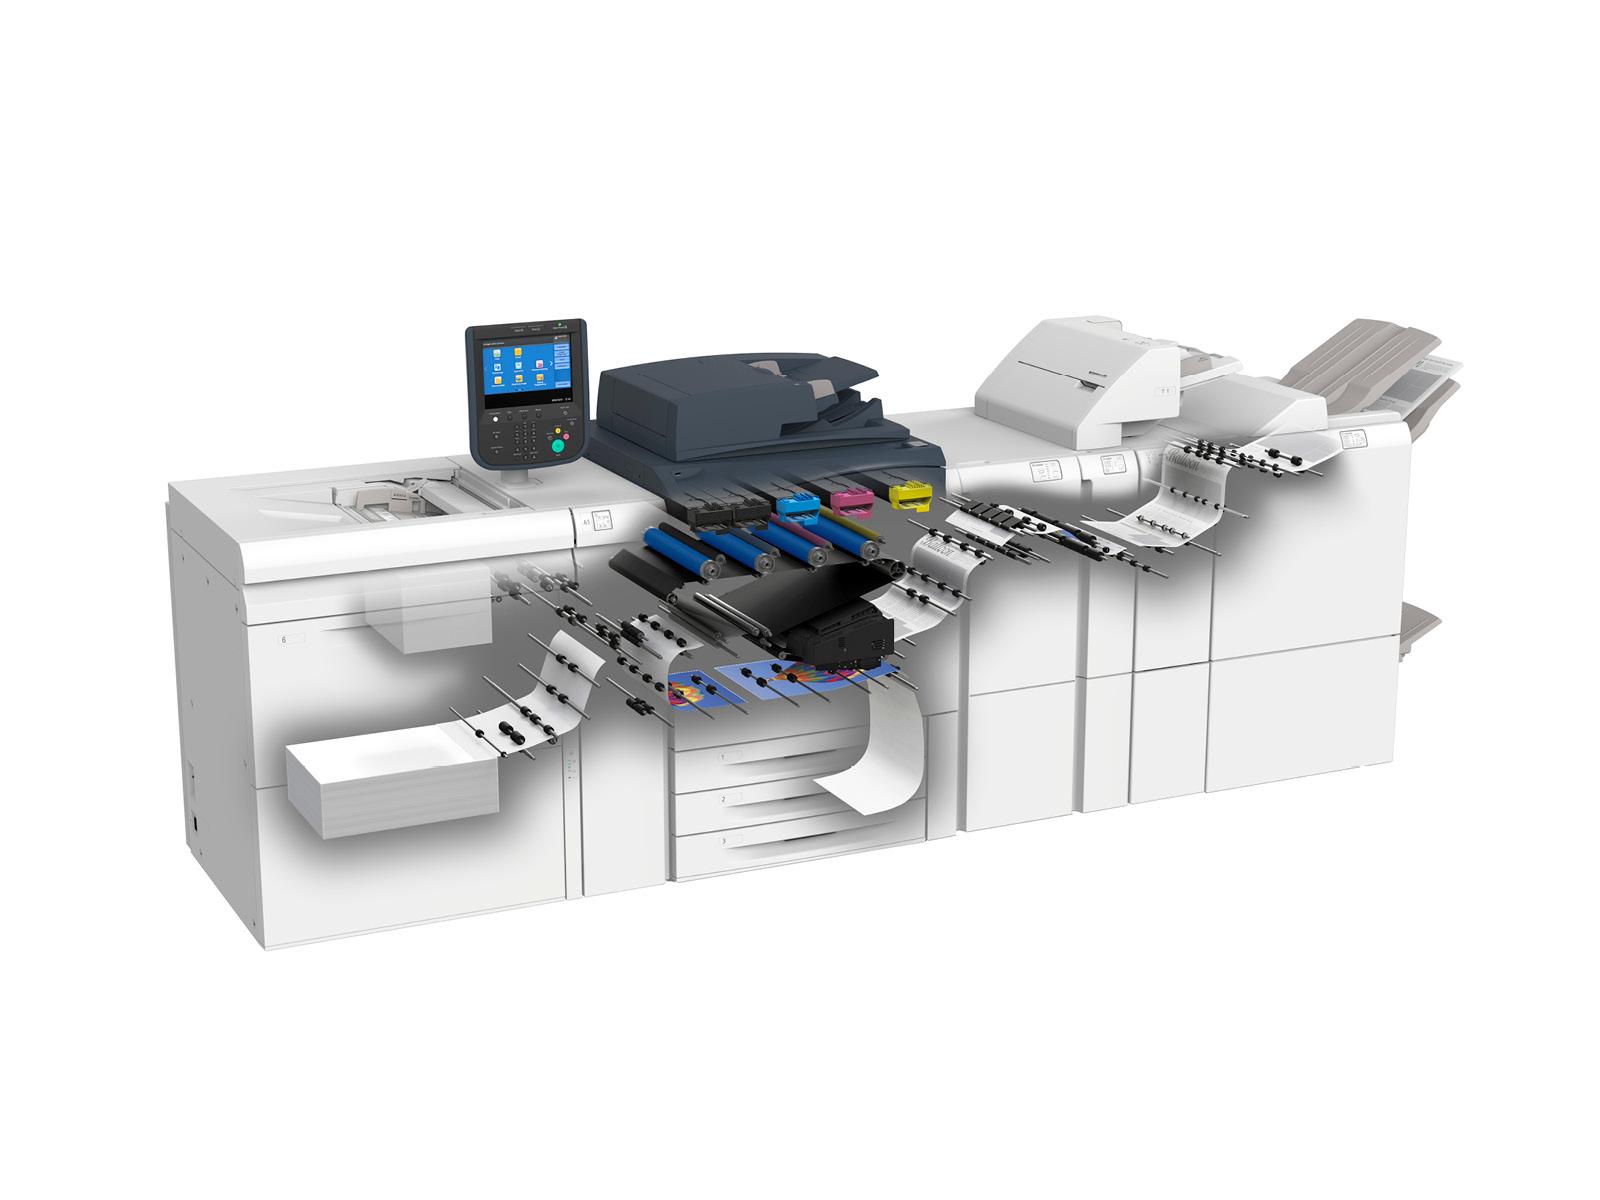 Xerox Versant 180 Press - Document Network Services Ltd